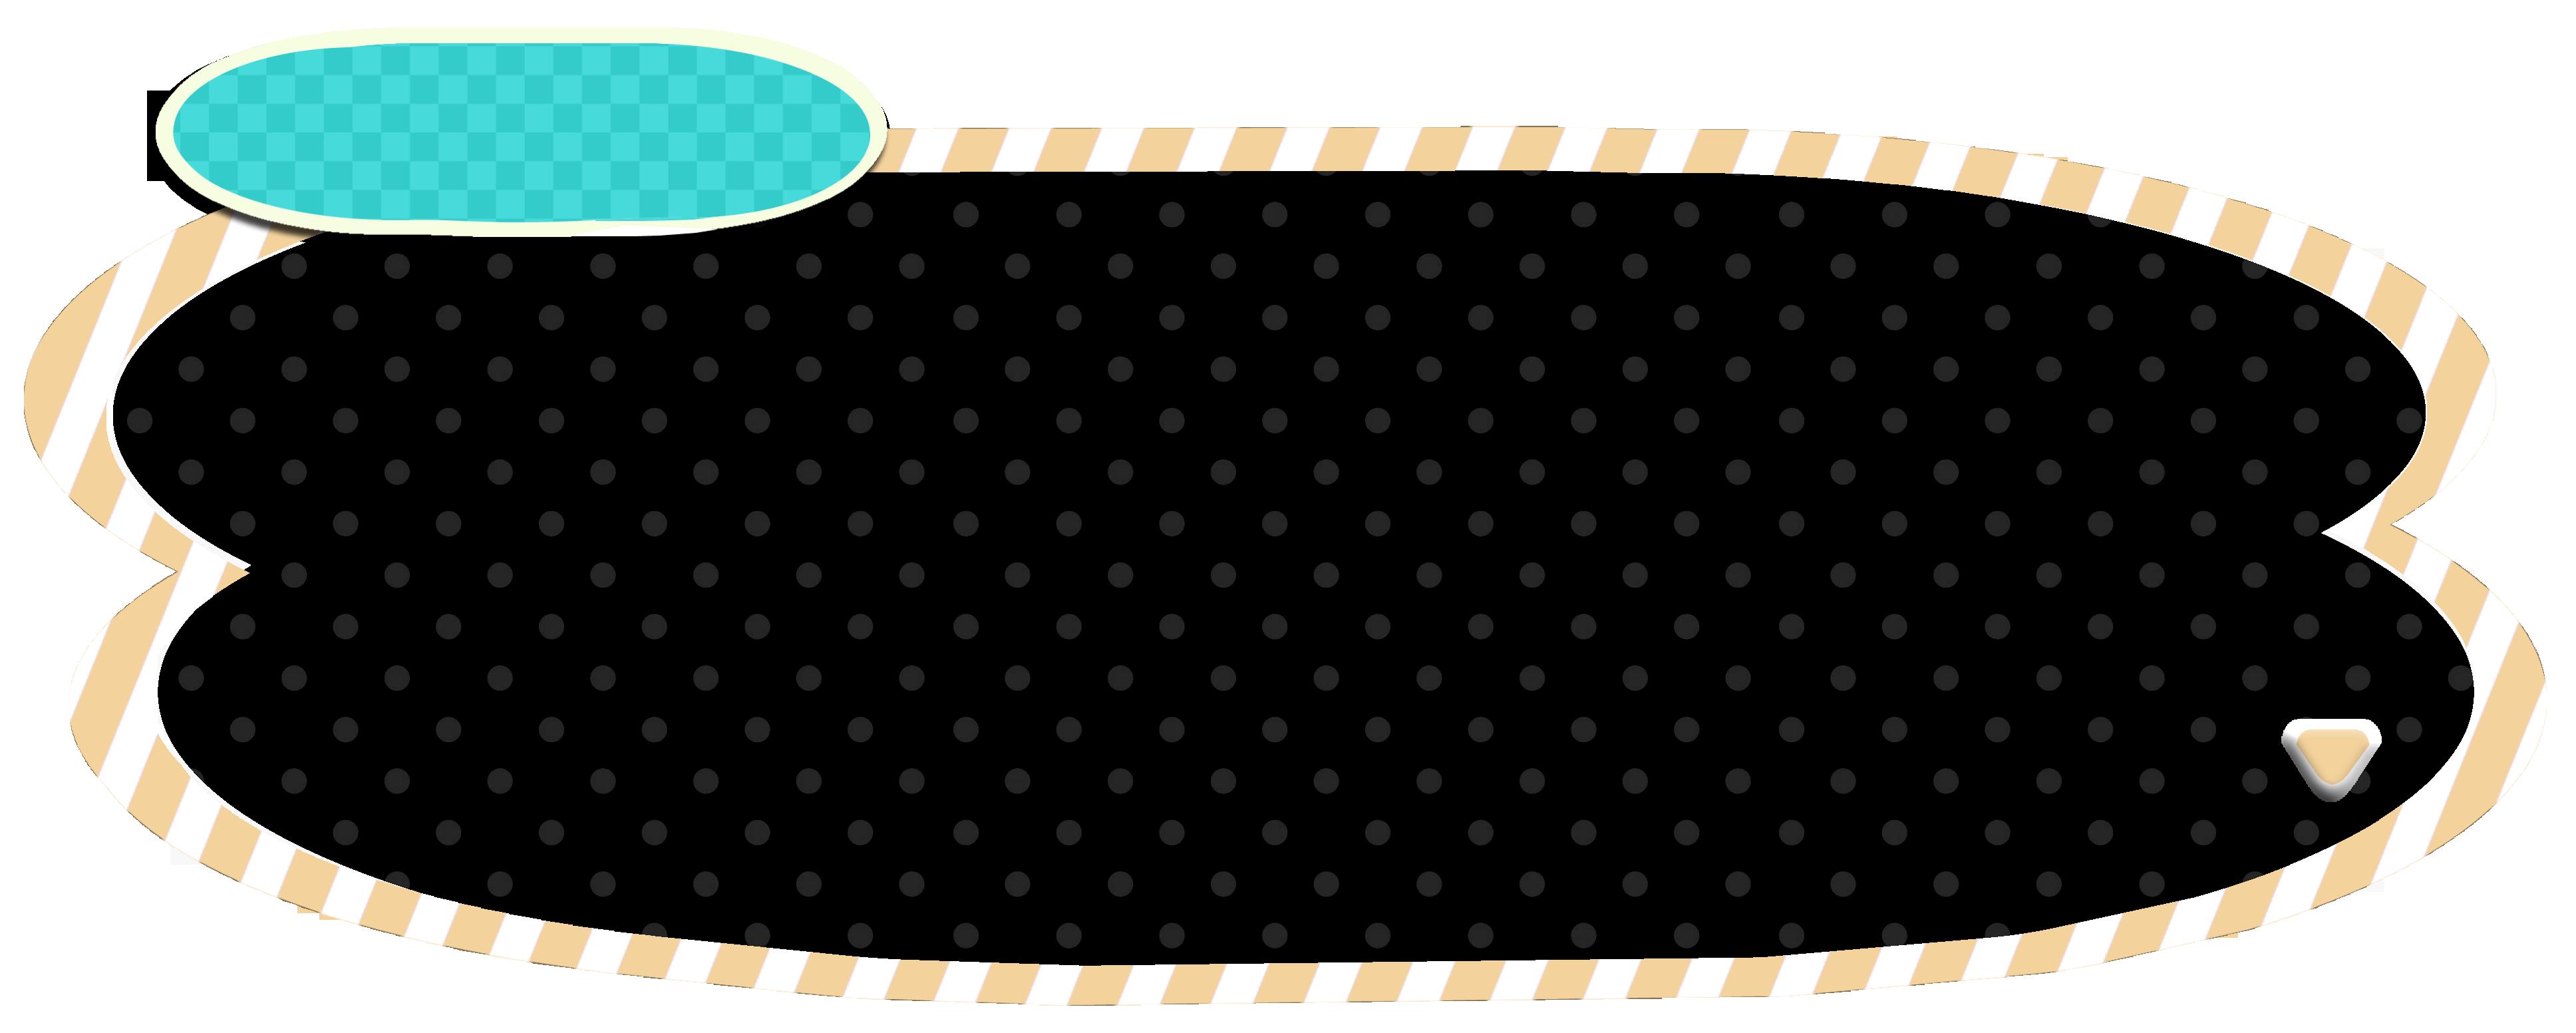 Animal Crossing Dialogue Box Templates By Rogue Ranger On Deviantart